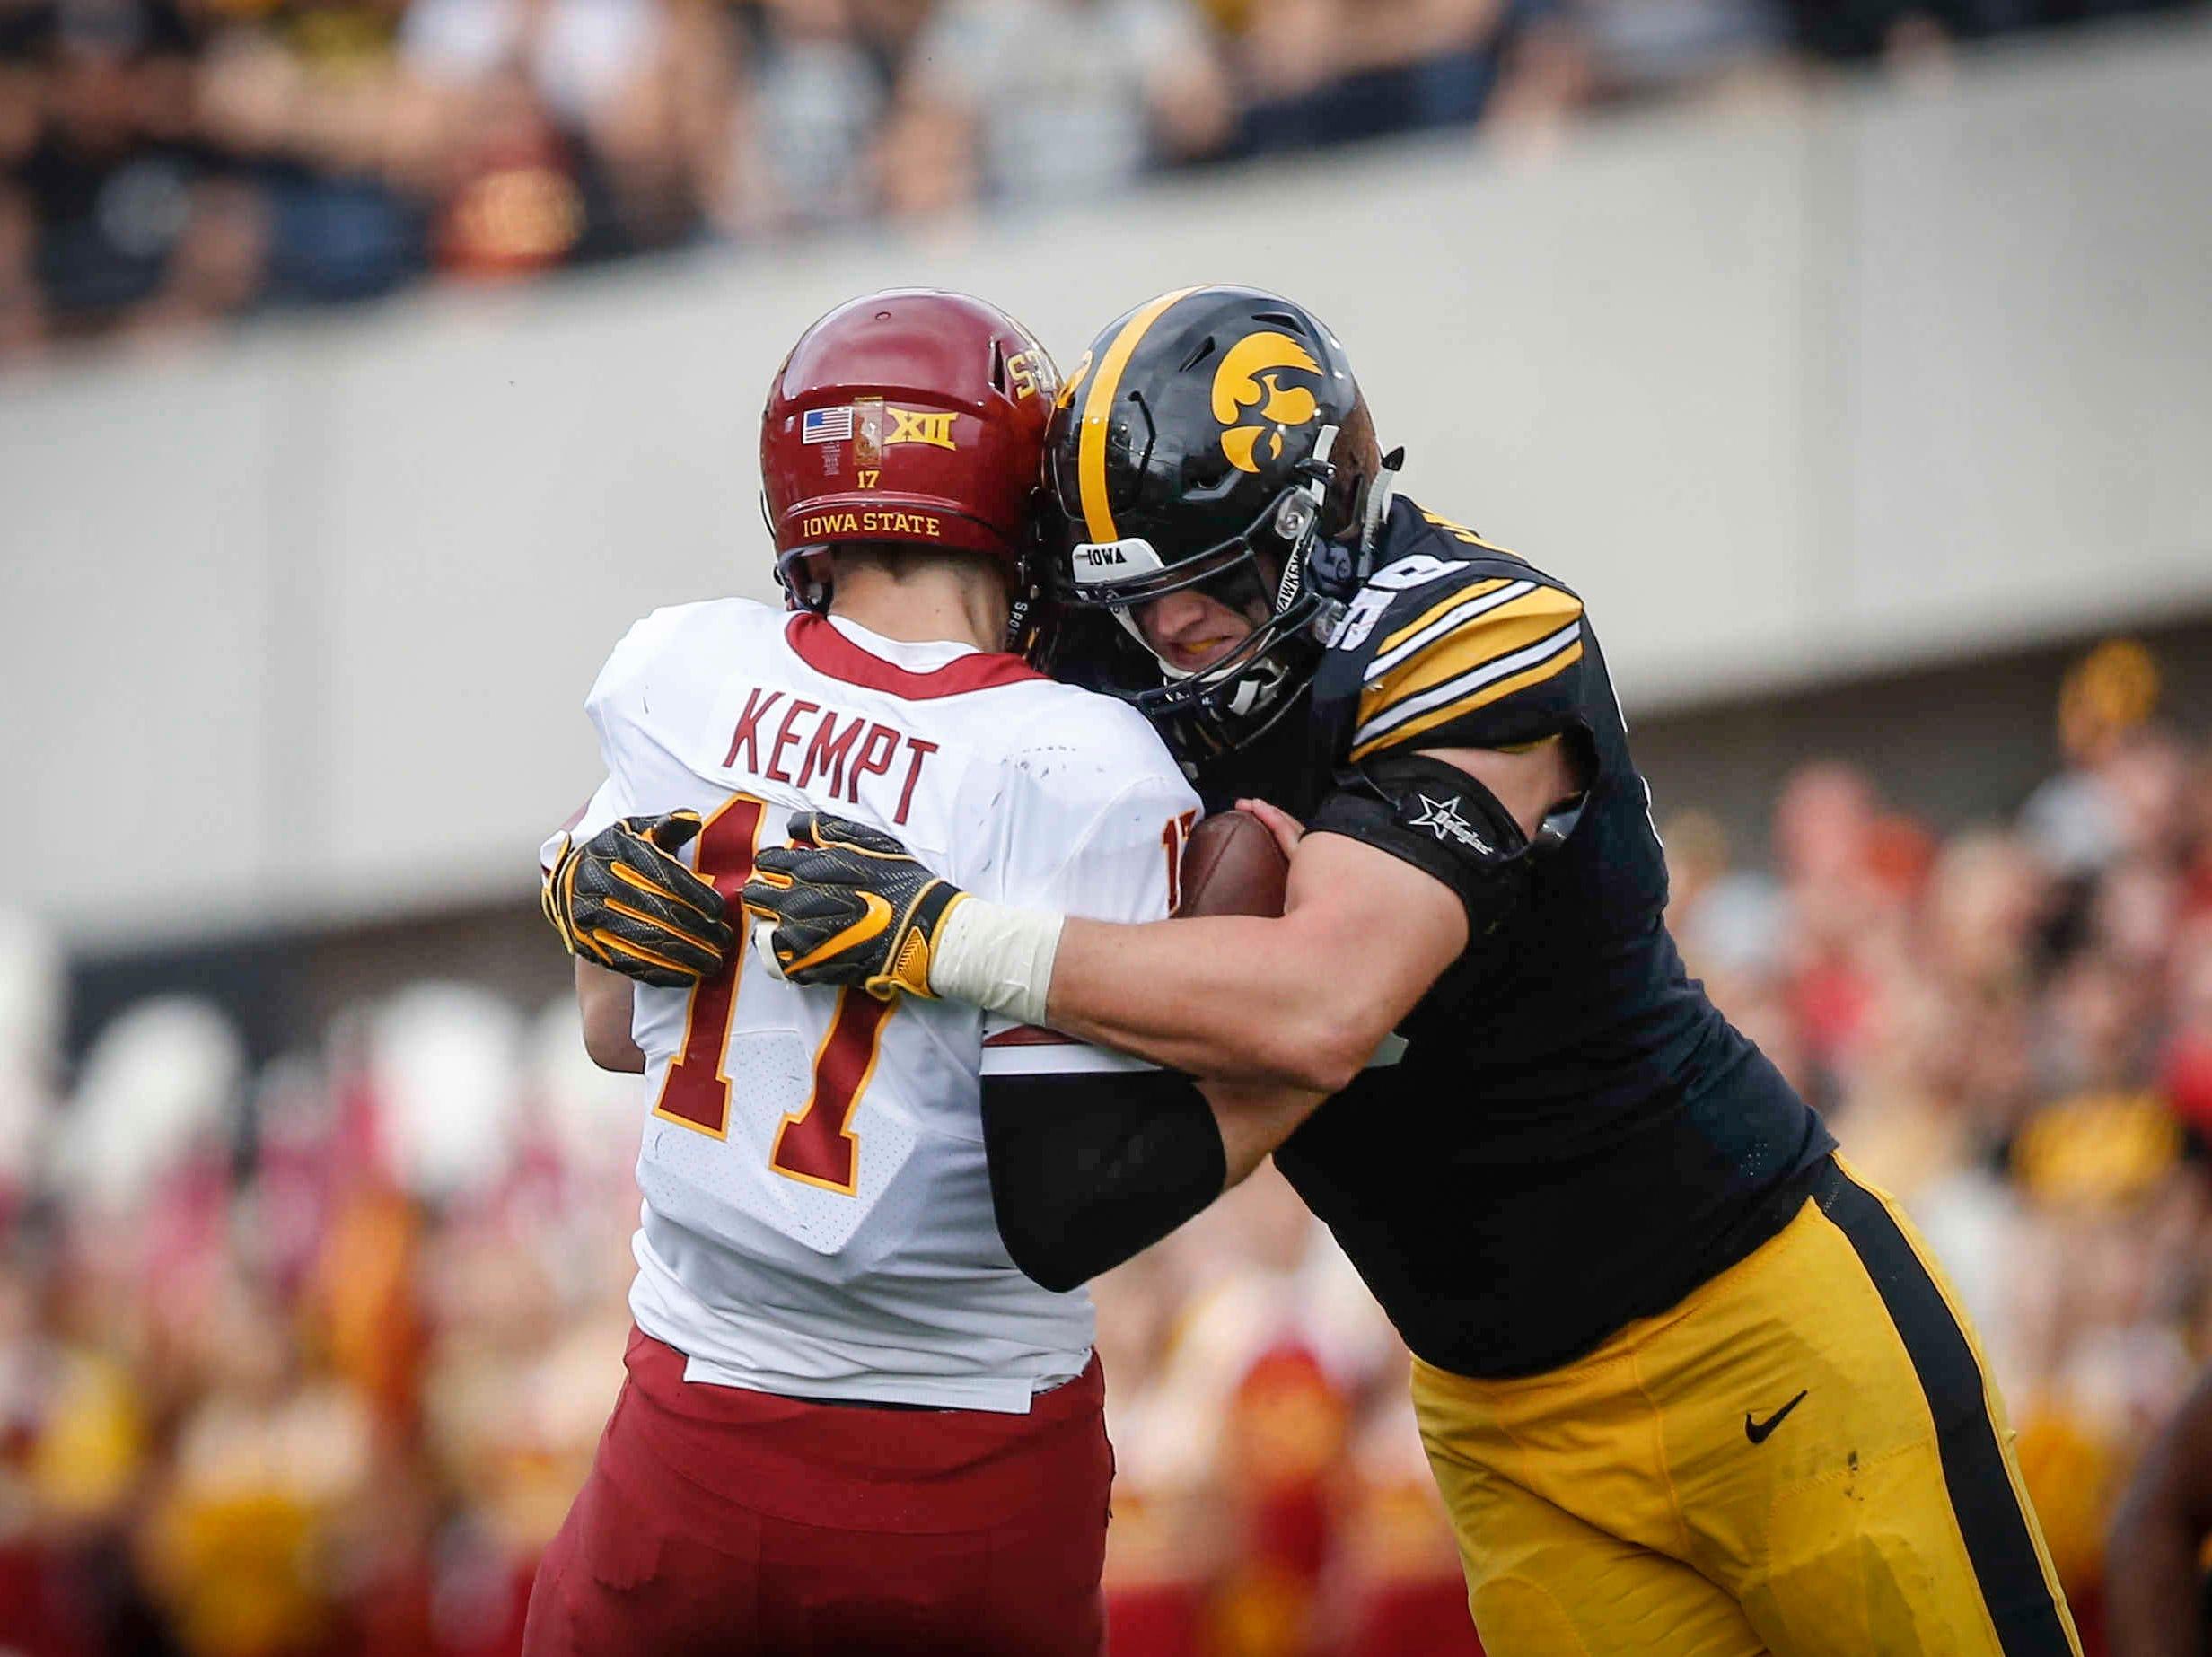 Iowa right tackle Matt Nelson sacks Iowa State quarterback Kyle Kempt in the second quarter on Saturday, Sept. 8, 2018, at Kinnick Stadium in Iowa City.